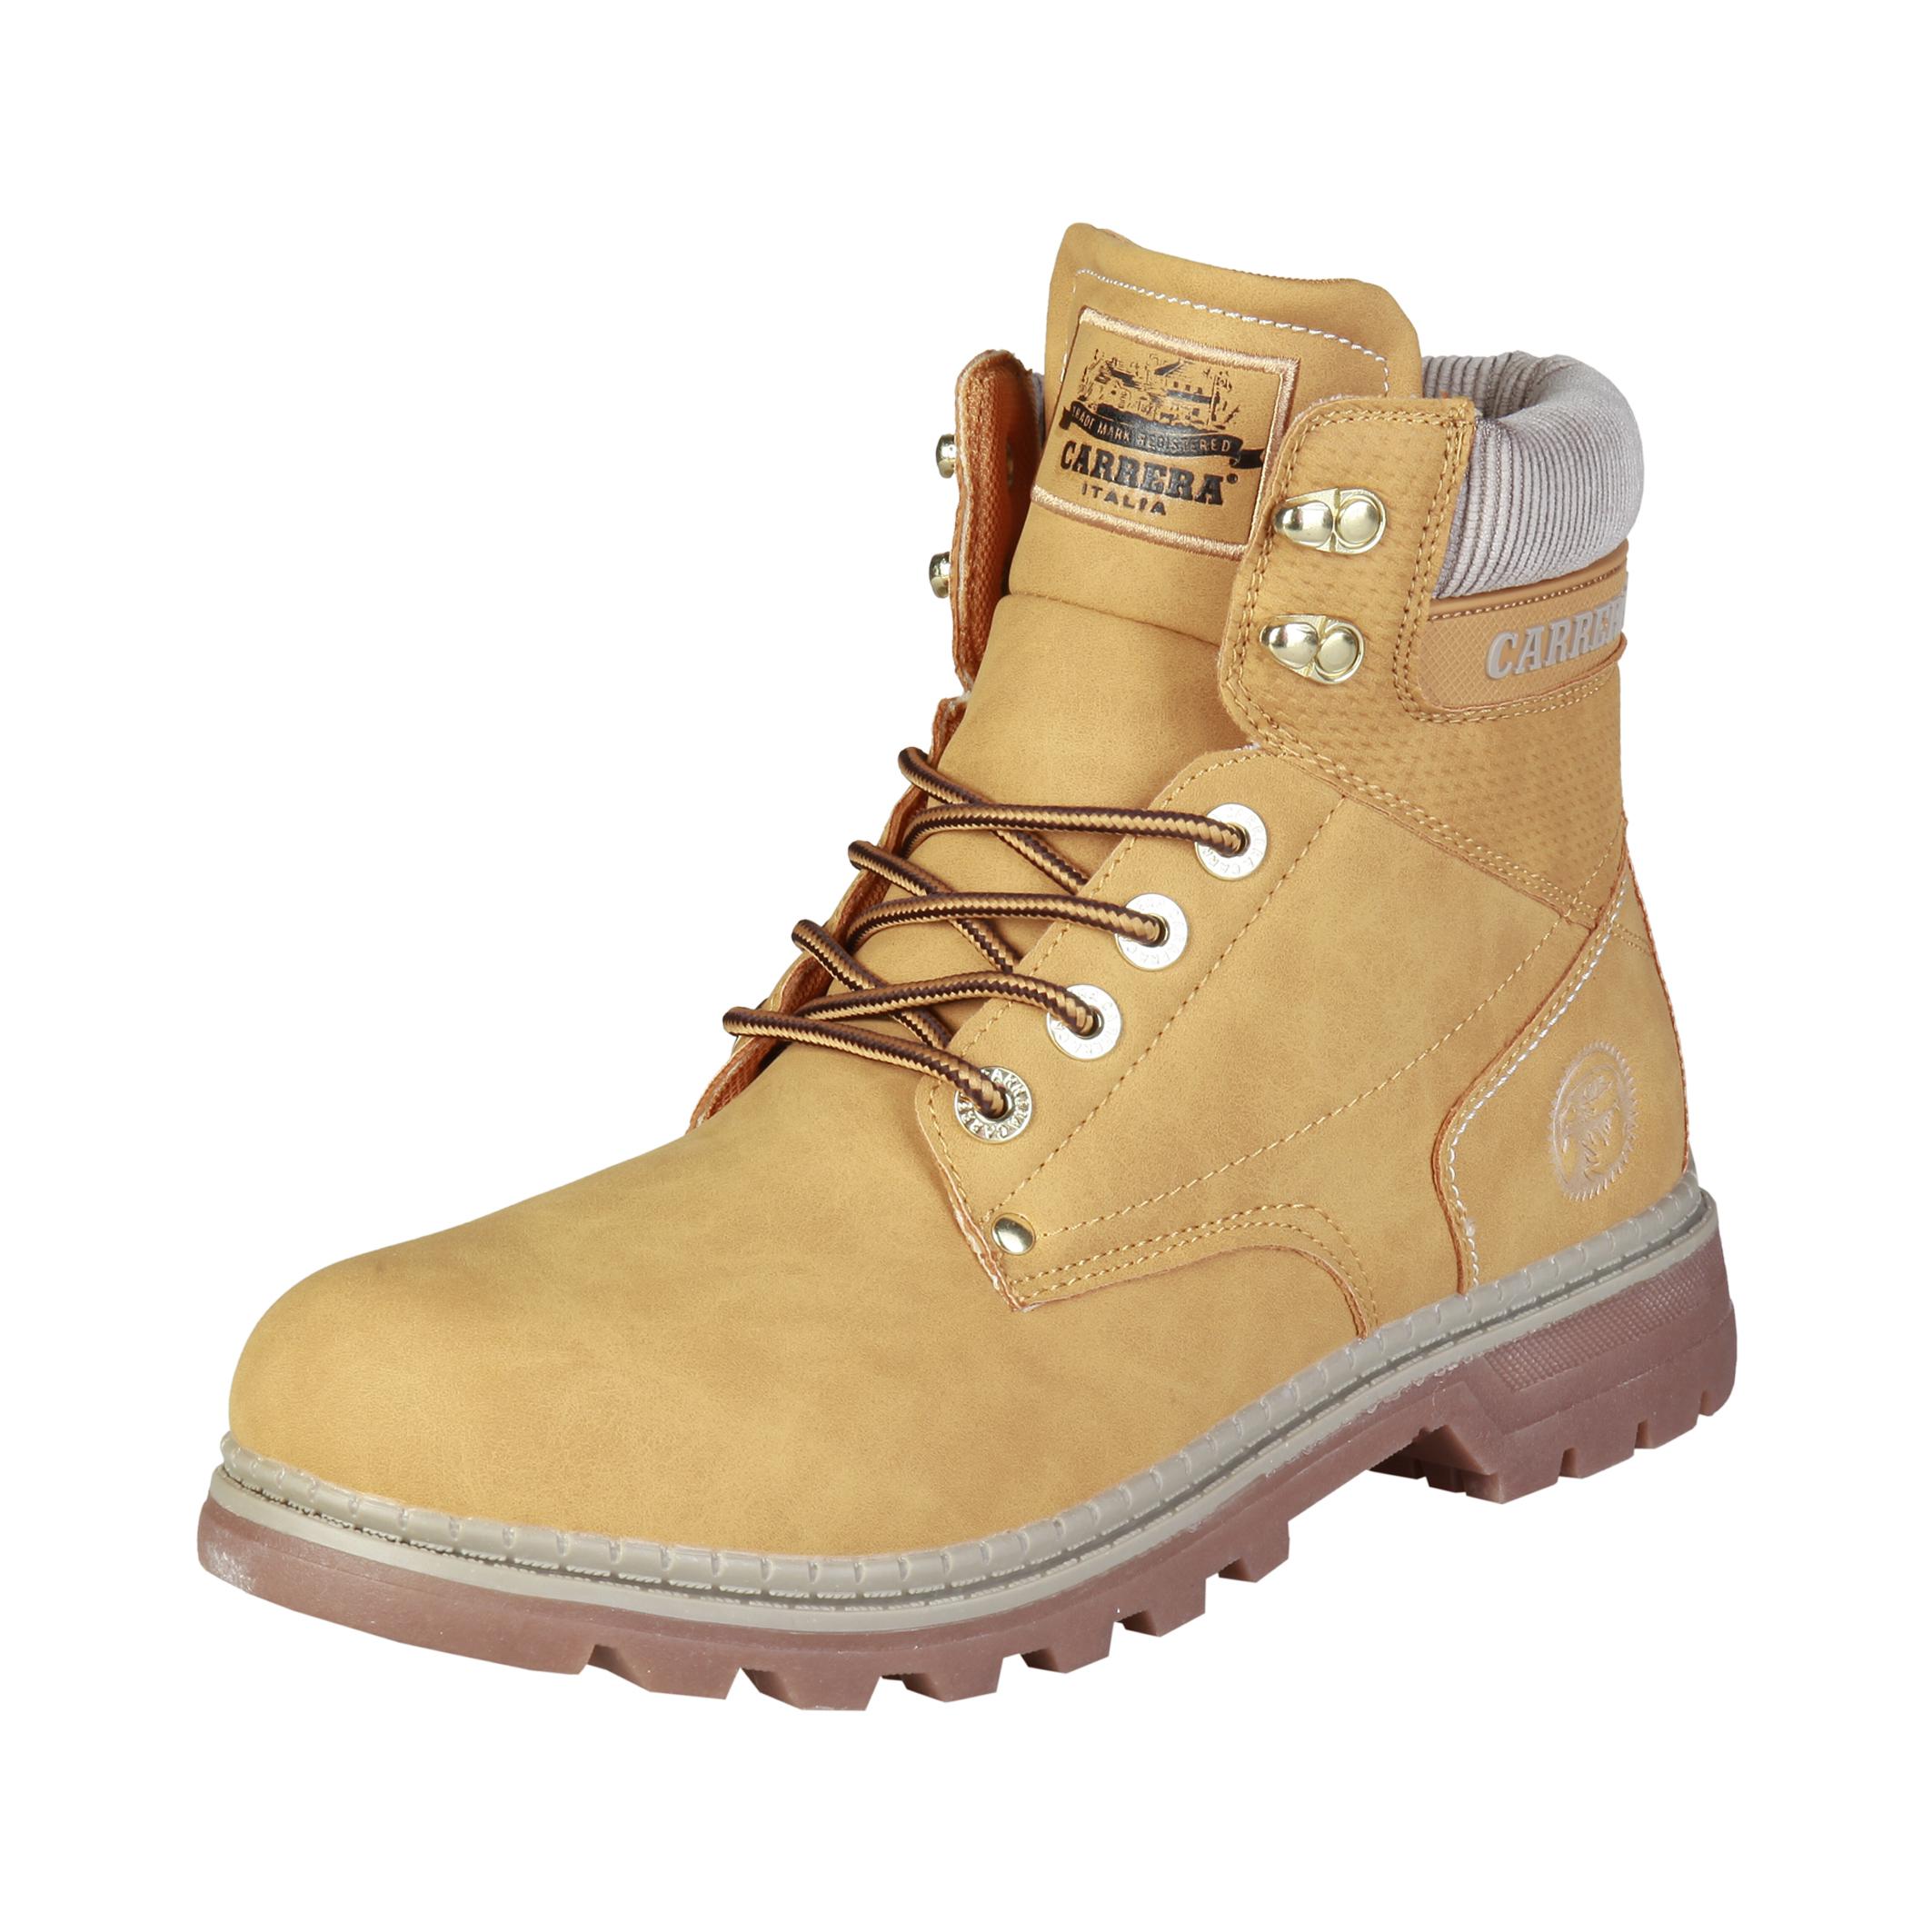 the best attitude e3b8a 24f45 Details zu Carrera Texas Herren Schuhe Warme Winter Boots Stiefel  Stiefeletten Braun